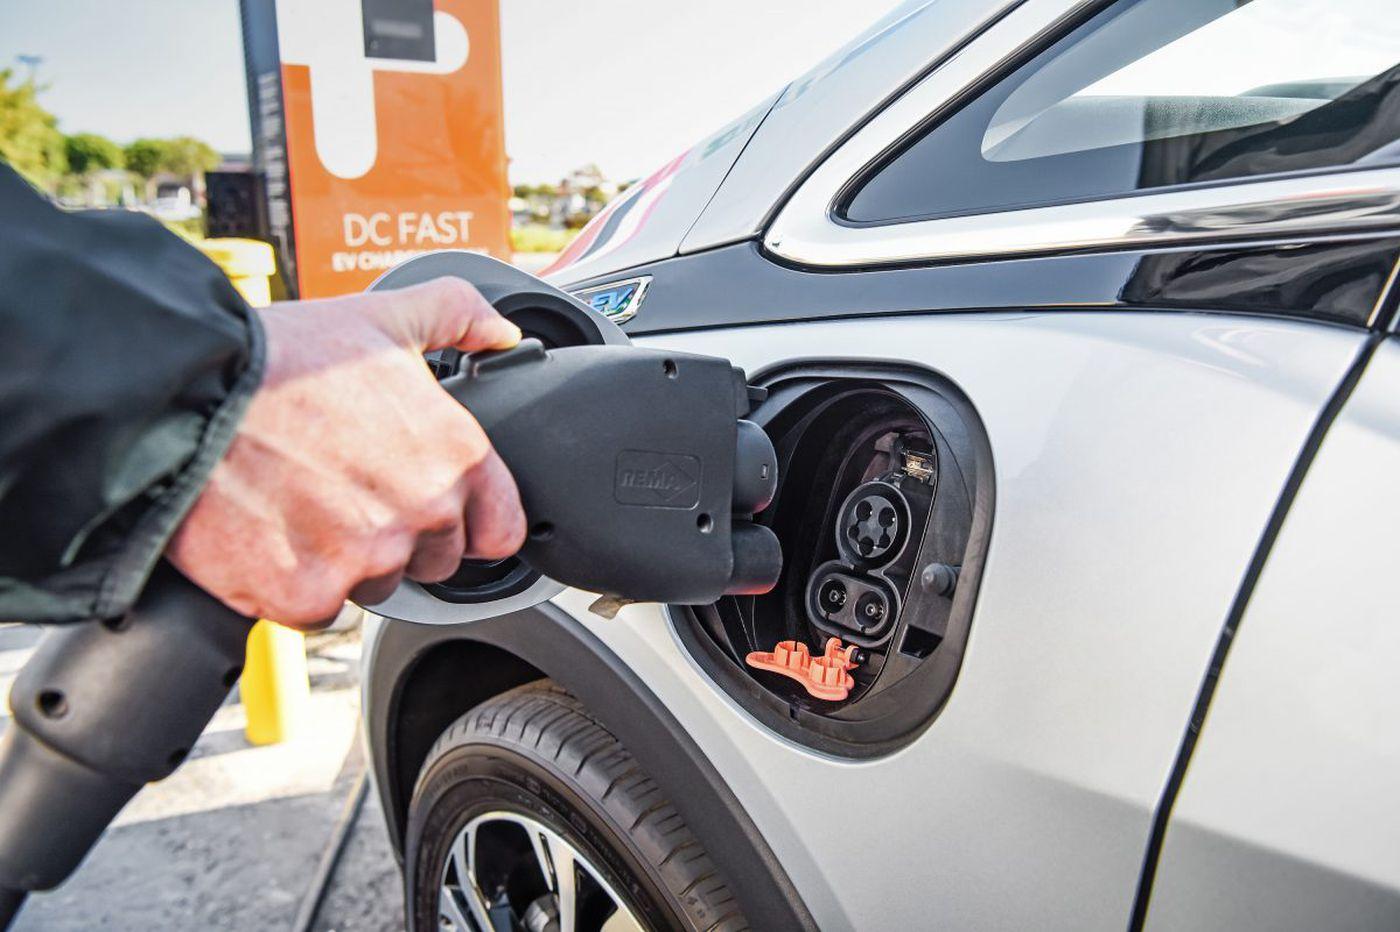 BMW knocks $10K off electric vehicle price in N.J.